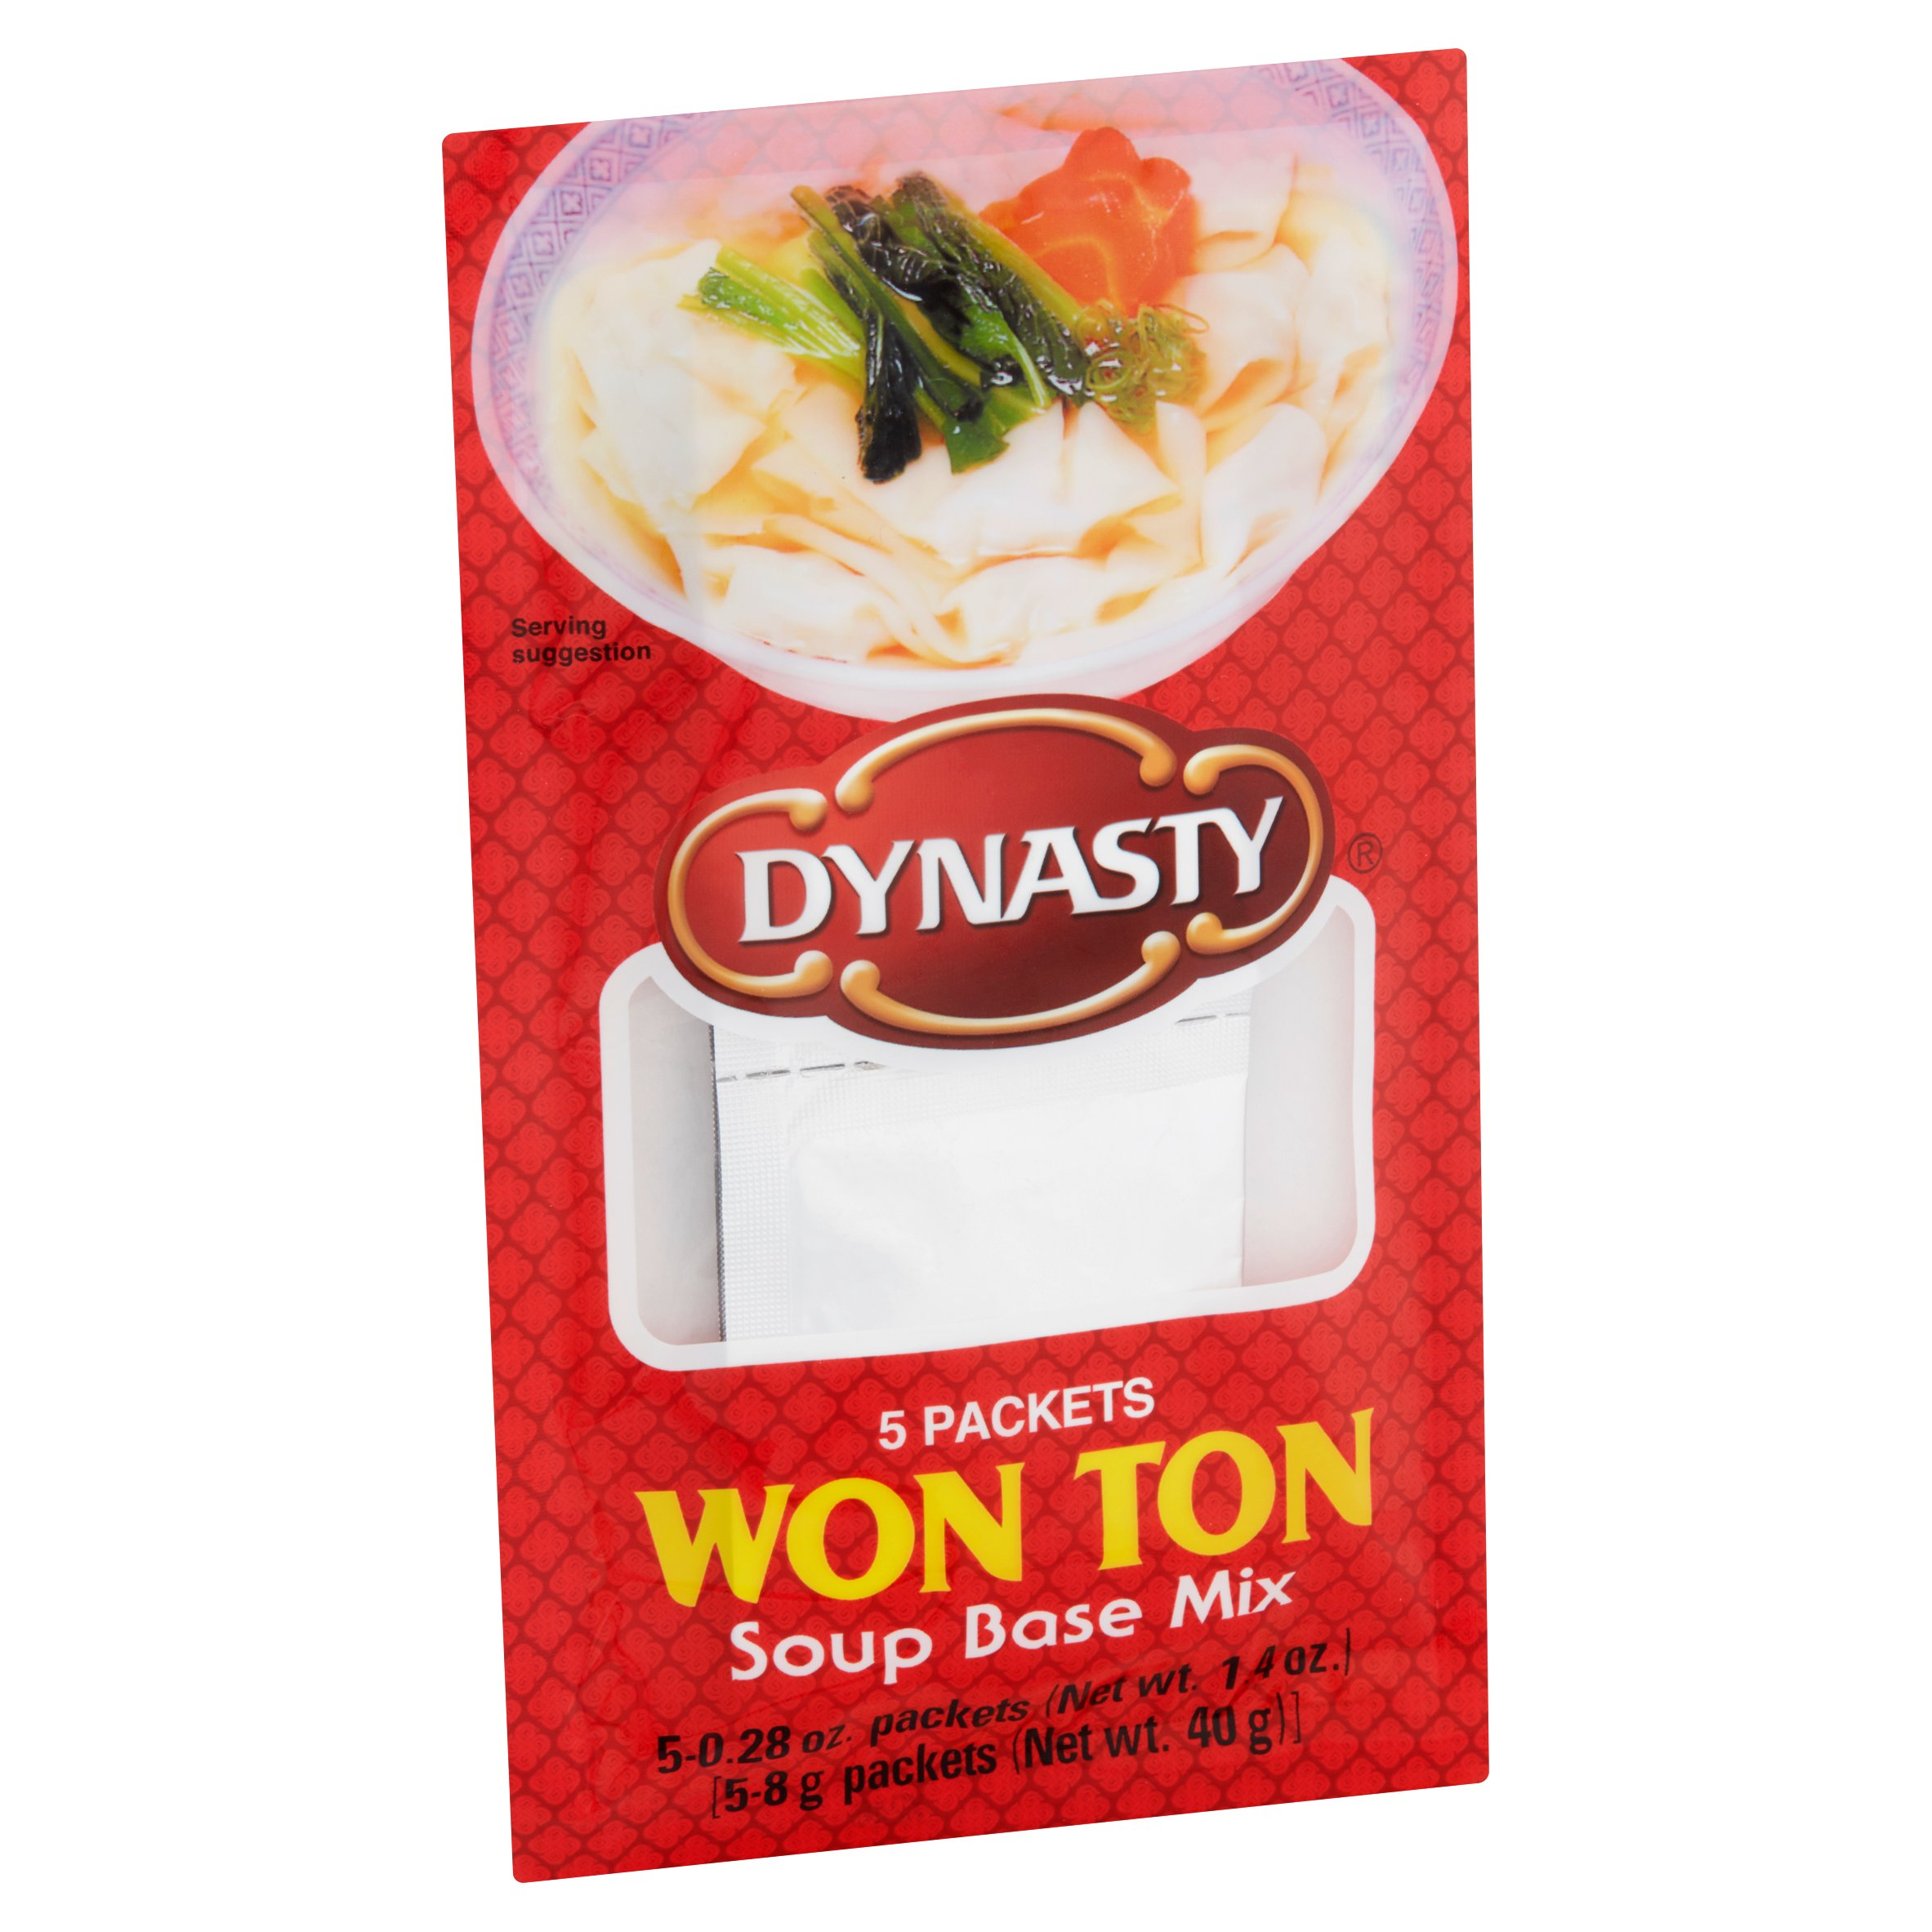 DYNASTY - WONTON - SOUP BASE MIX - 1.4oz-(5packets)